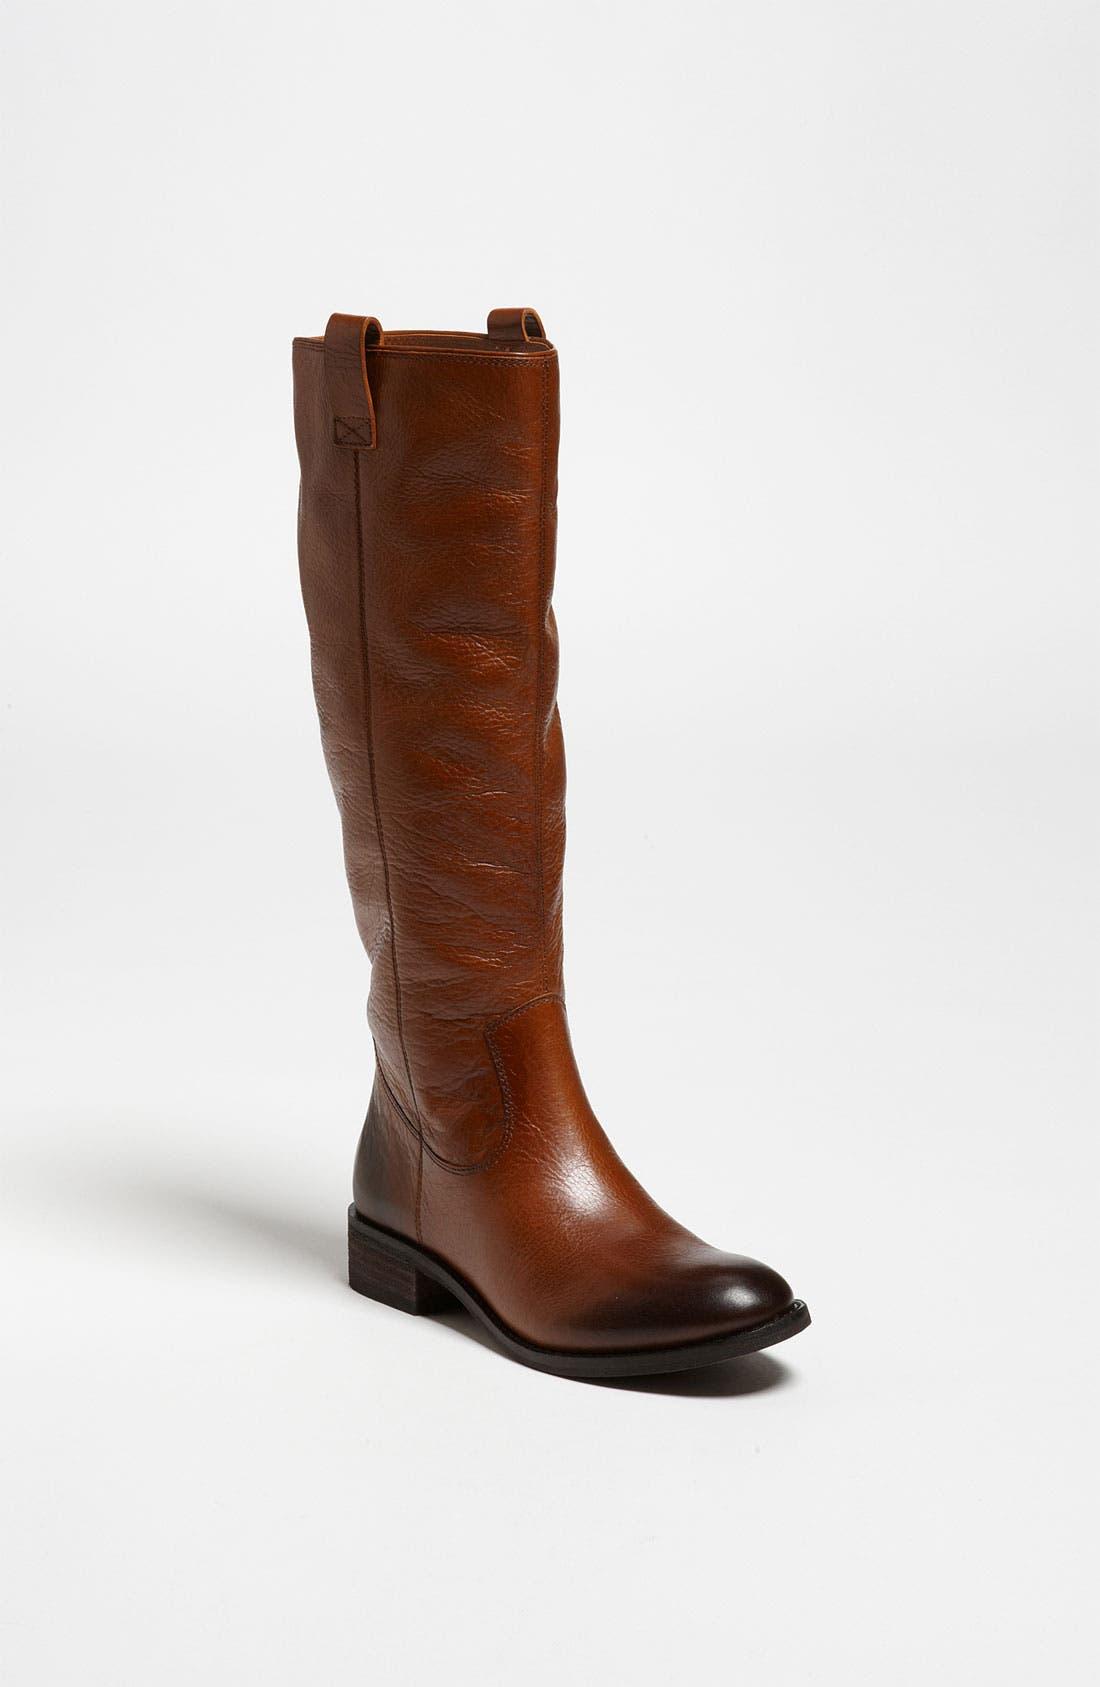 Alternate Image 1 Selected - Jessica Simpson 'Esteem' Boot (Wide Calf)